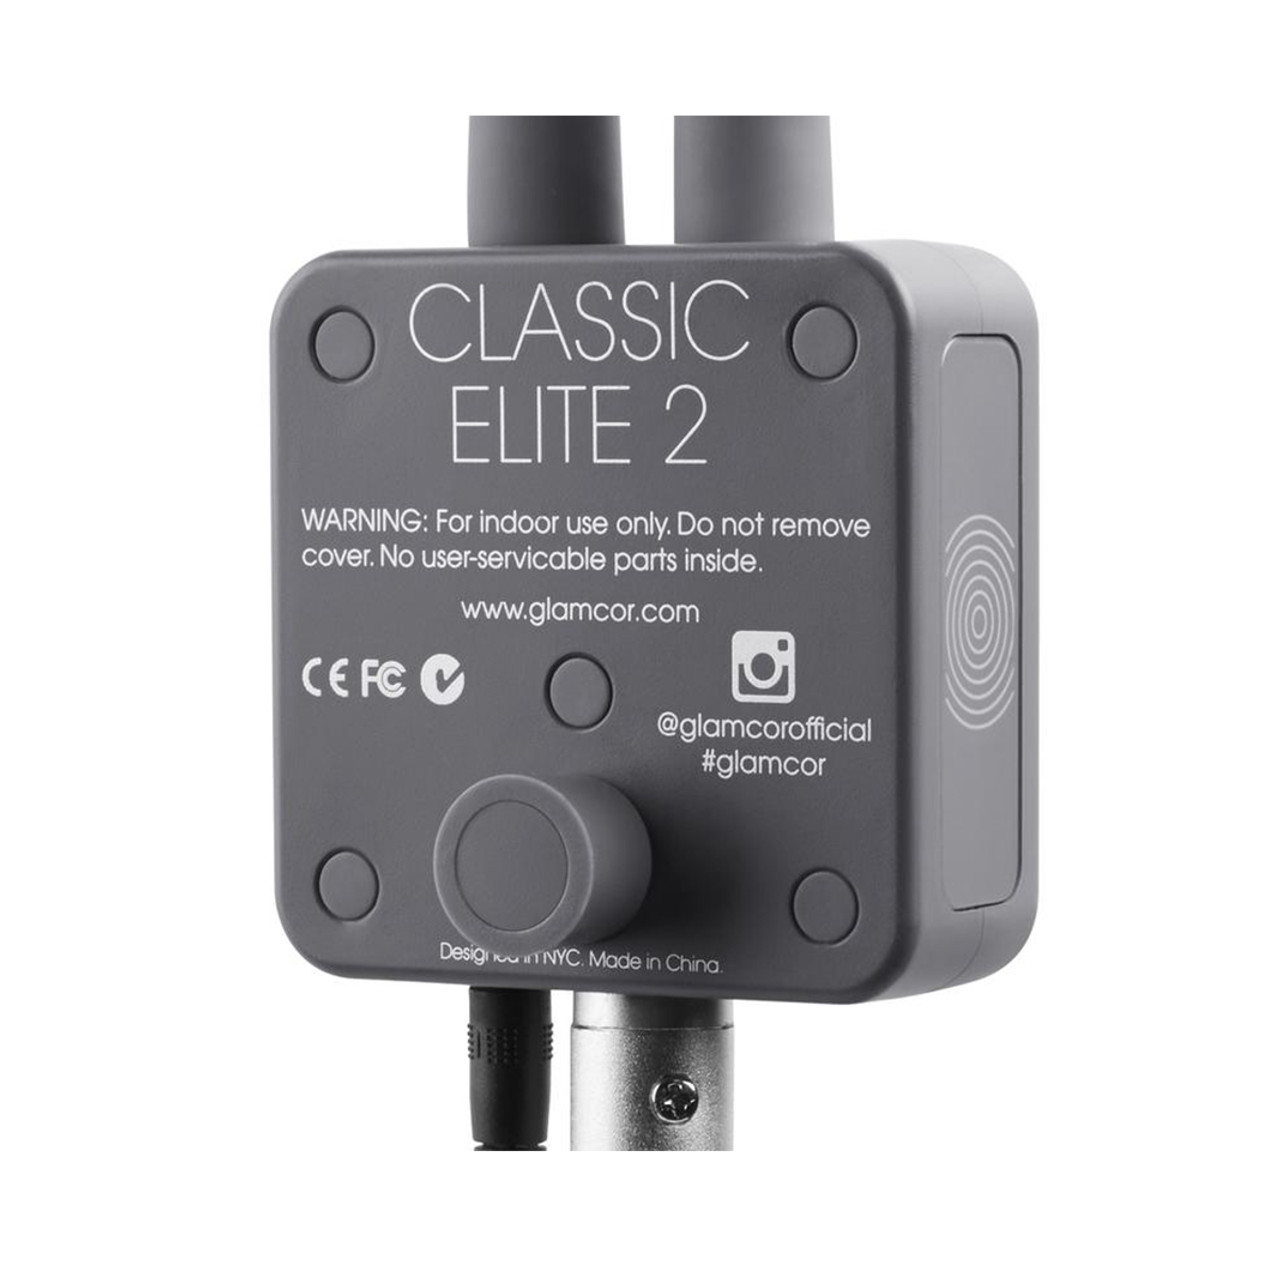 Glamcor Classic Elite 2